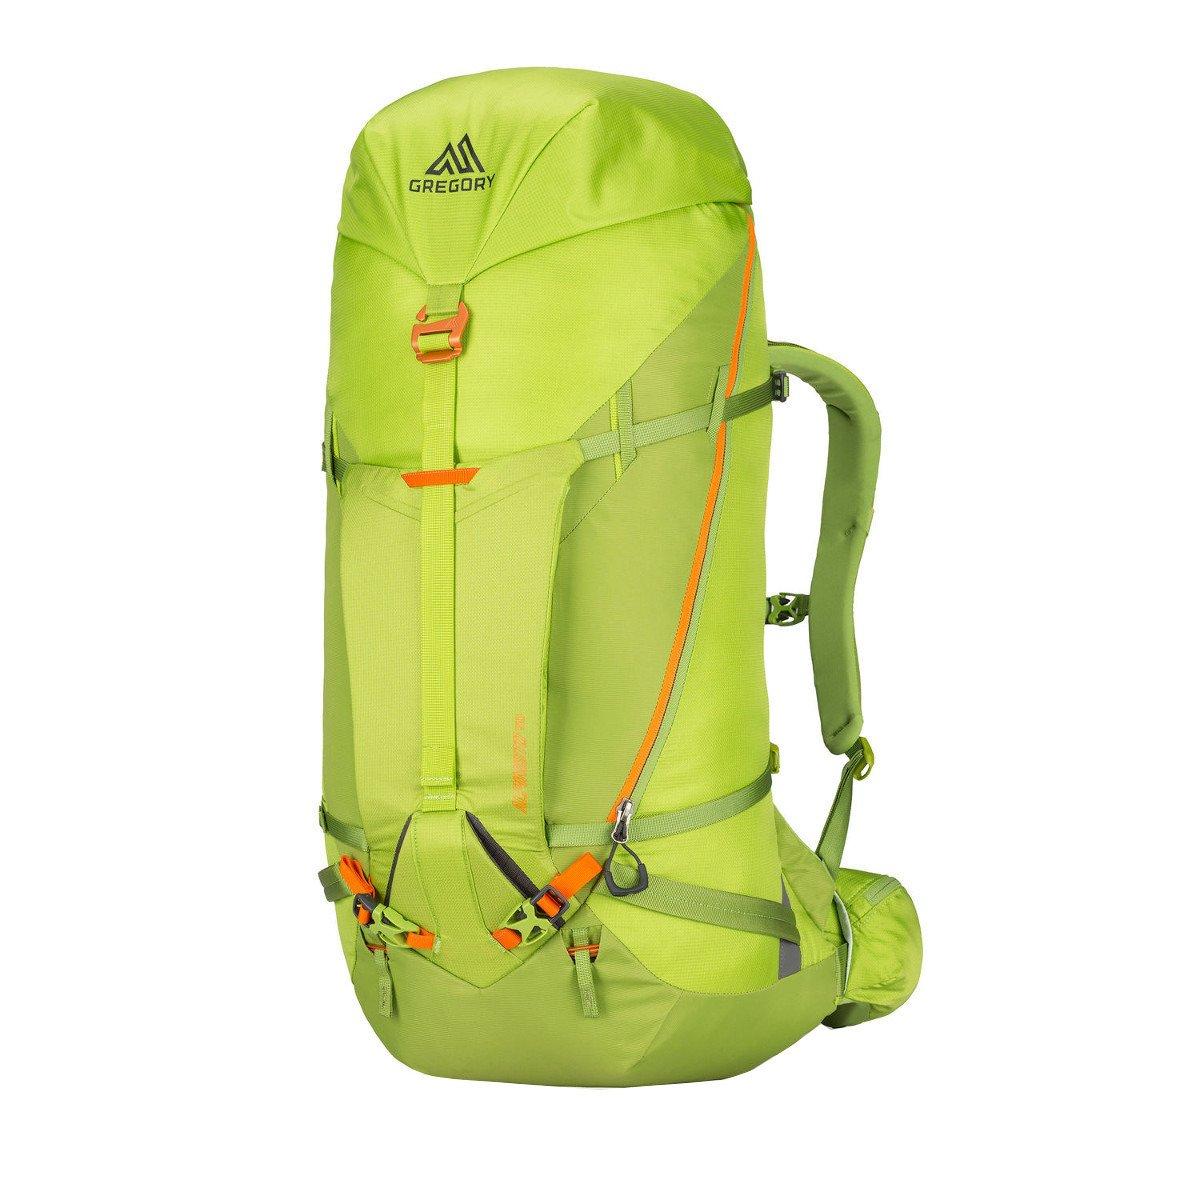 c2893d205be5e Plecak ALPINISTO 50 | podróże i trekking \ plecaki \ duże > 50 litrów  podróże i trekking \ plecaki \ wspinaczkowe | TUTTU.pl